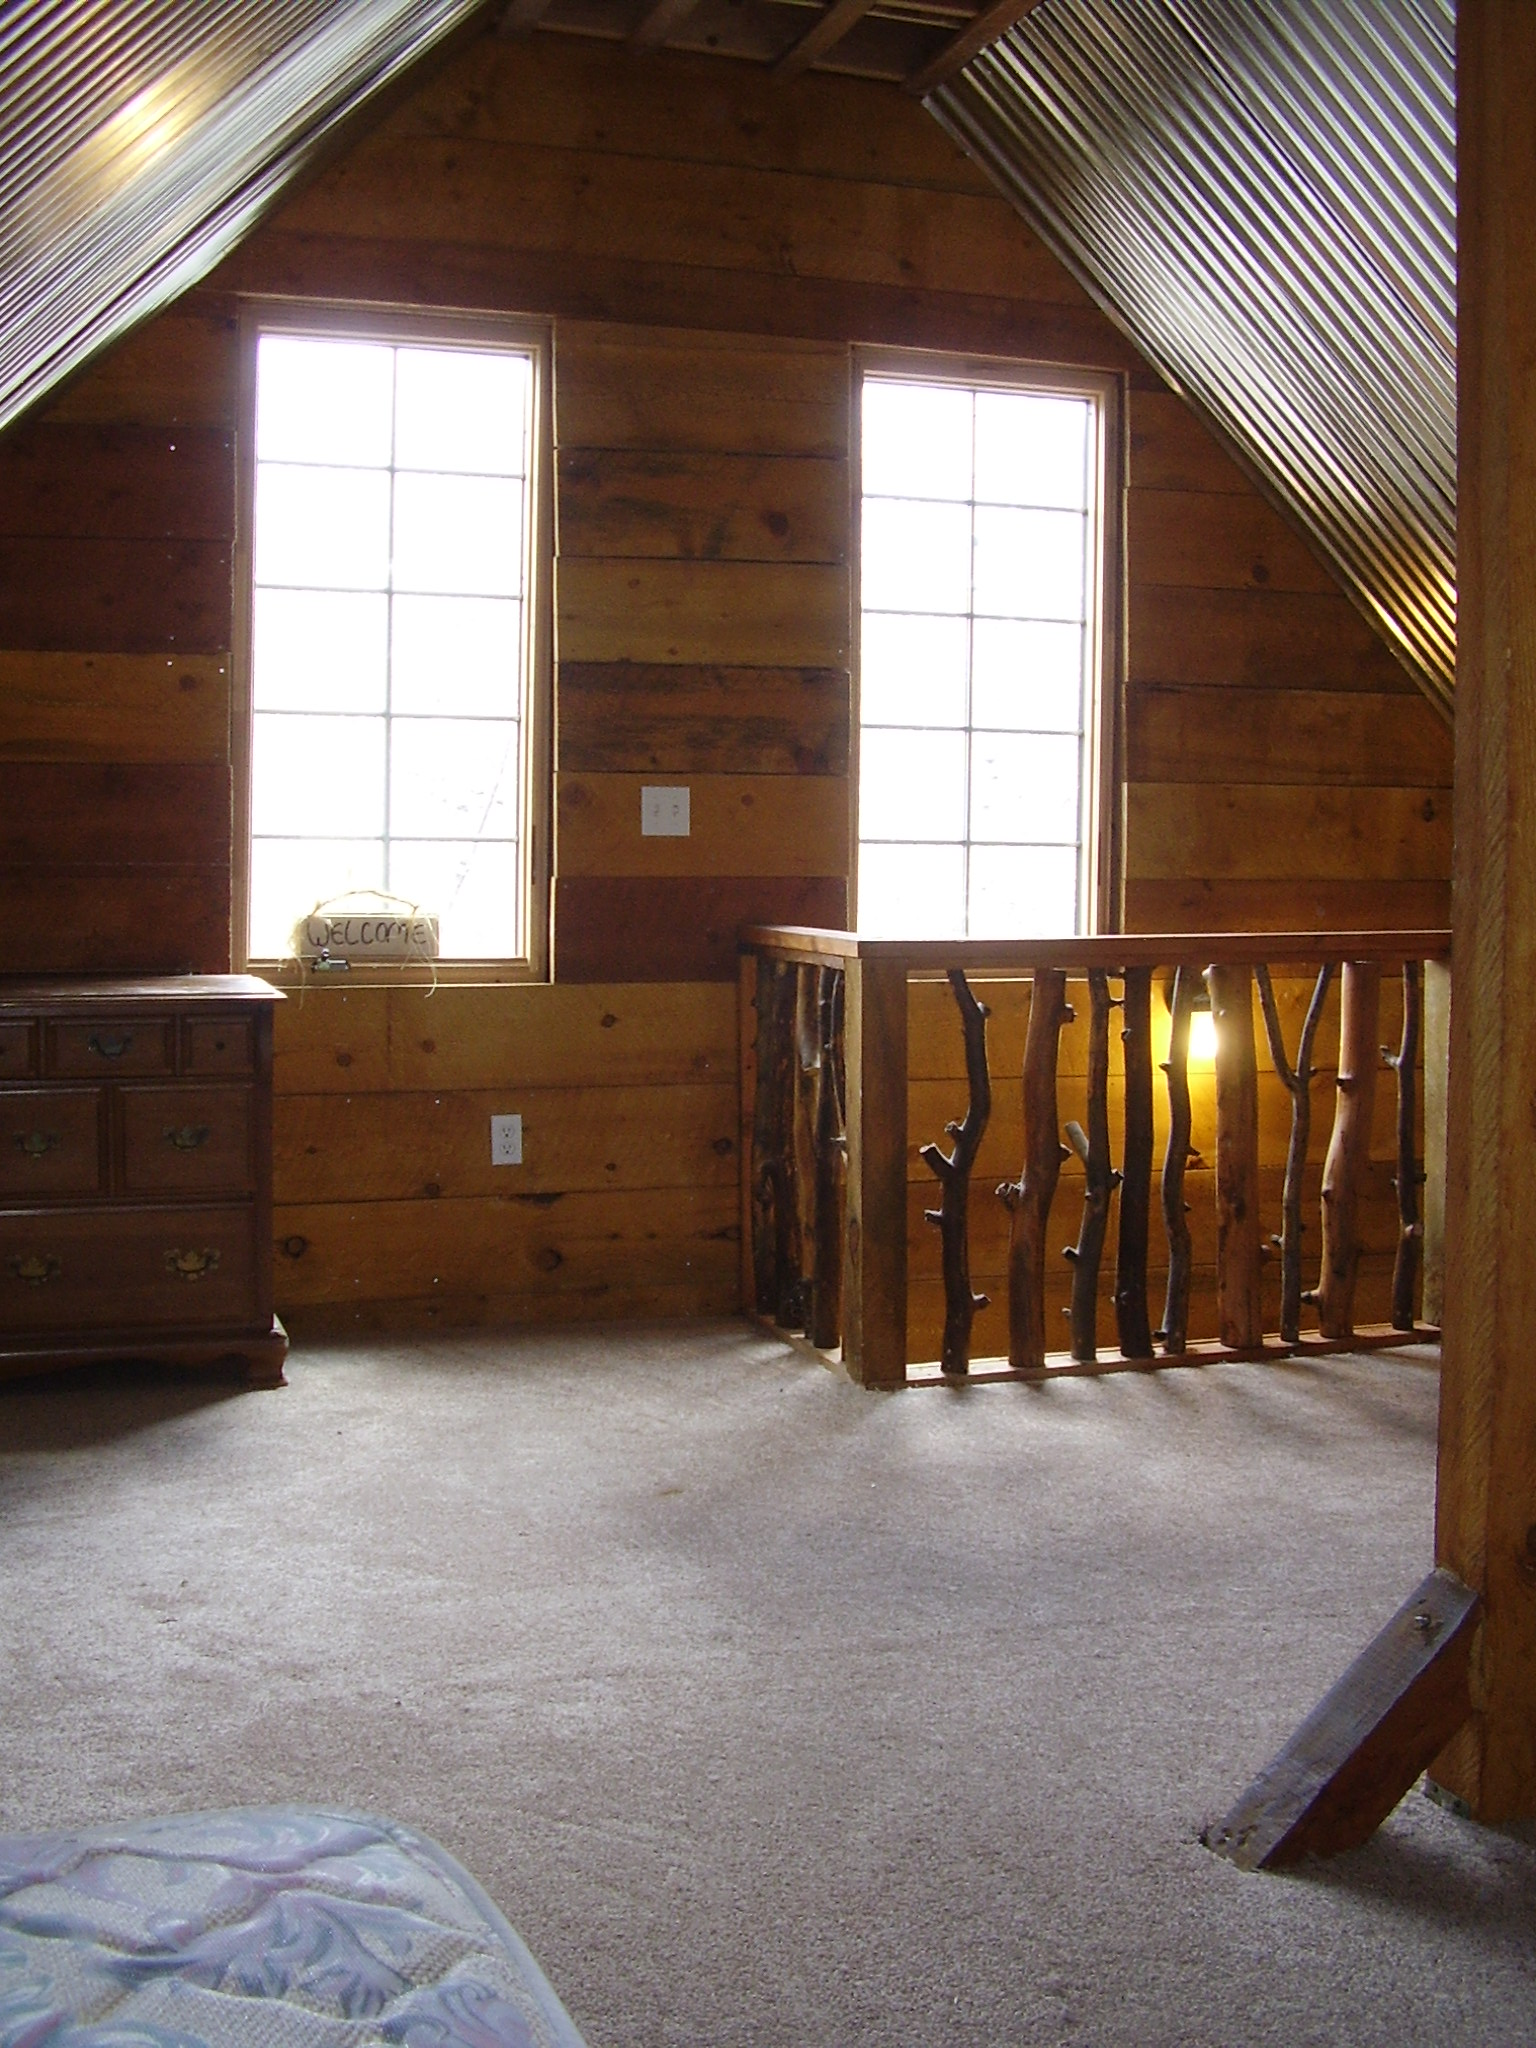 Duck Creek Utah Real Estate Cabin For Sale In Englestead